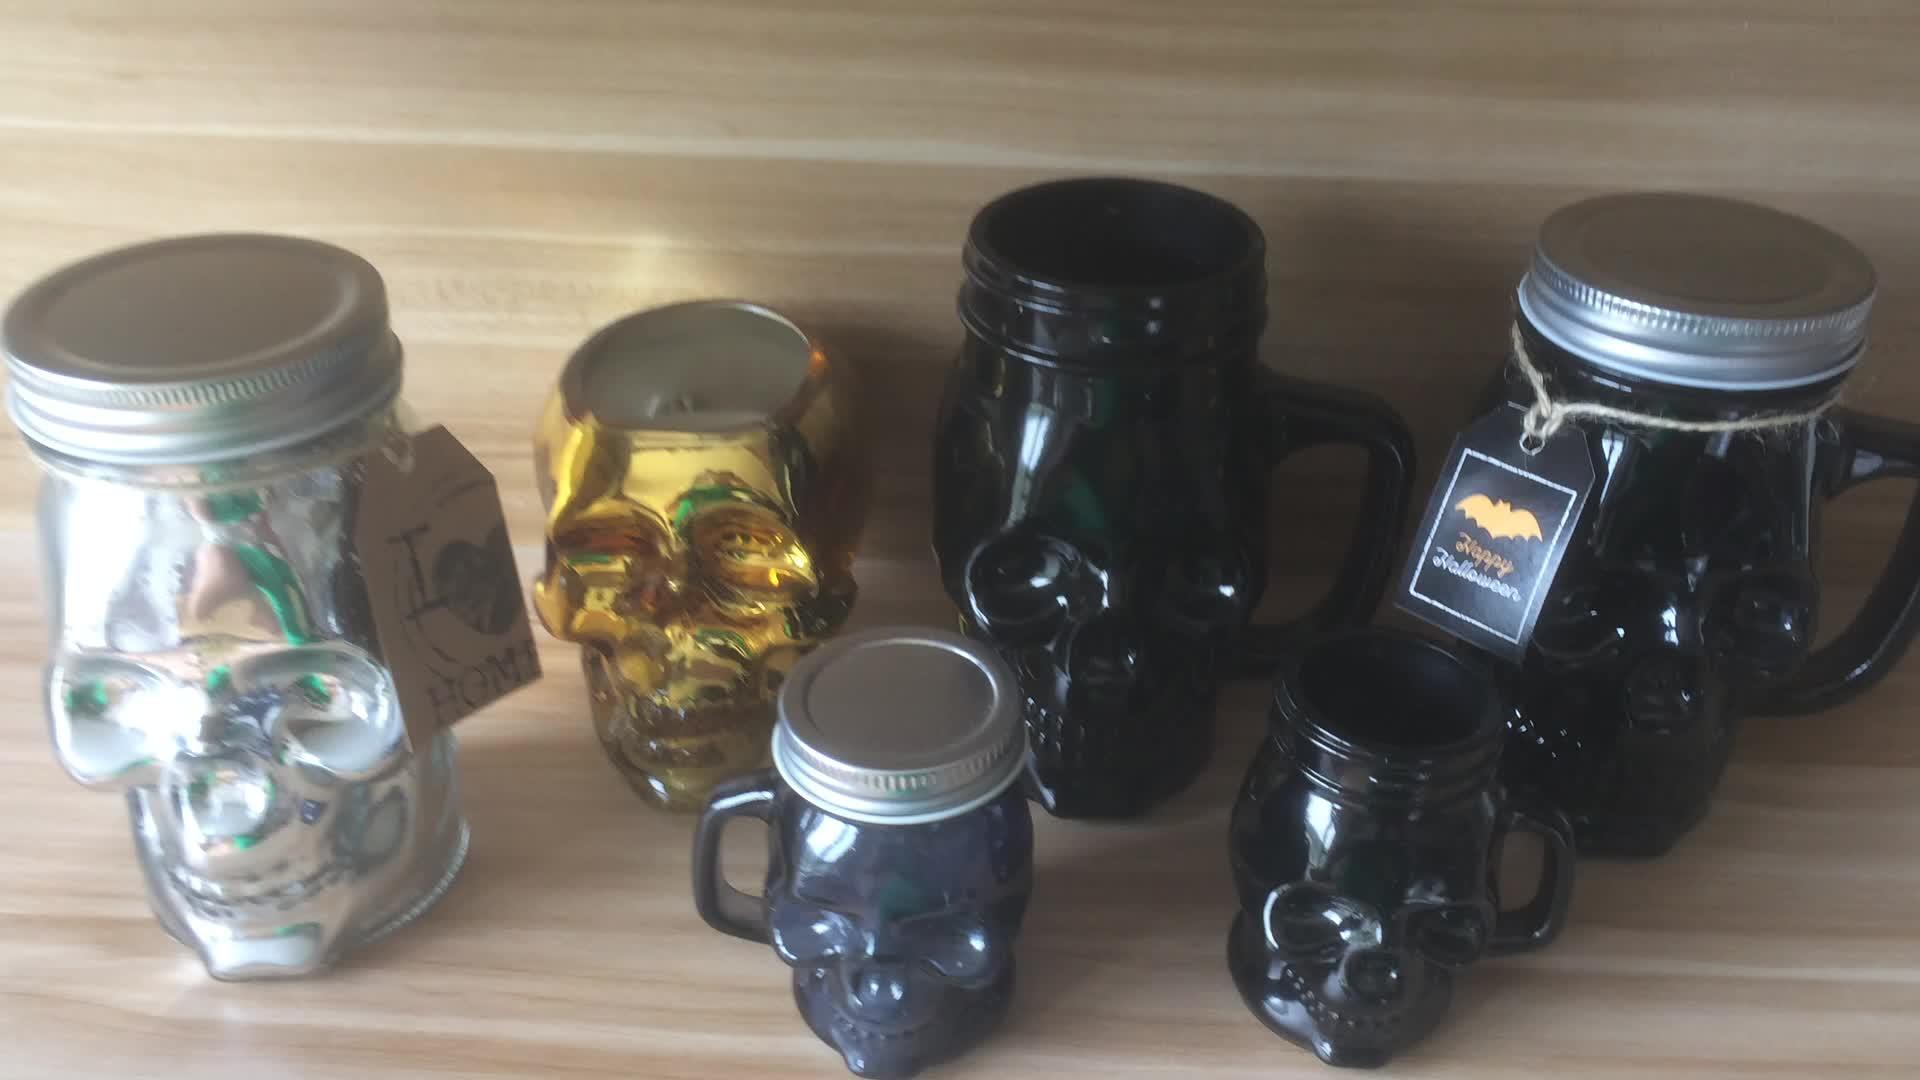 काले मेसन ग्लास जार प्राकृतिक सोया मोम सुगंधित हेलोवीन खोपड़ी मोमबत्ती